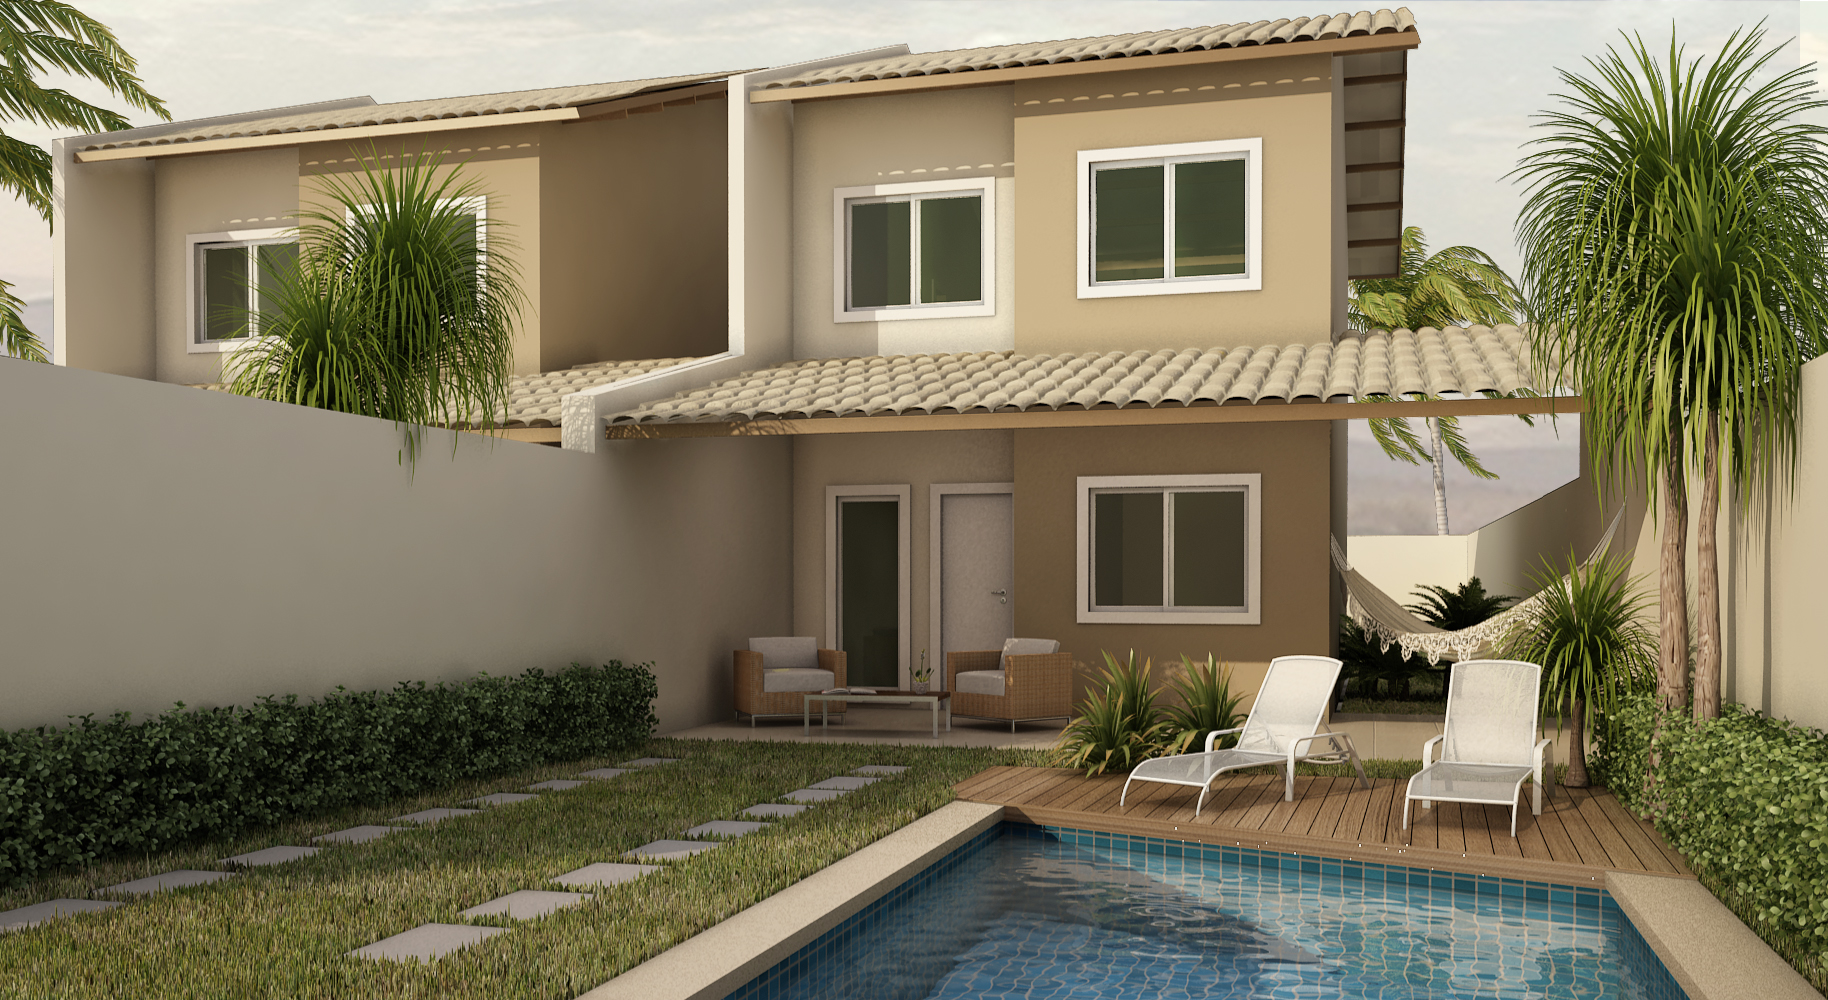 Fotos de fachadas de casas duplex decorando casas - Fotos casas bonitas ...